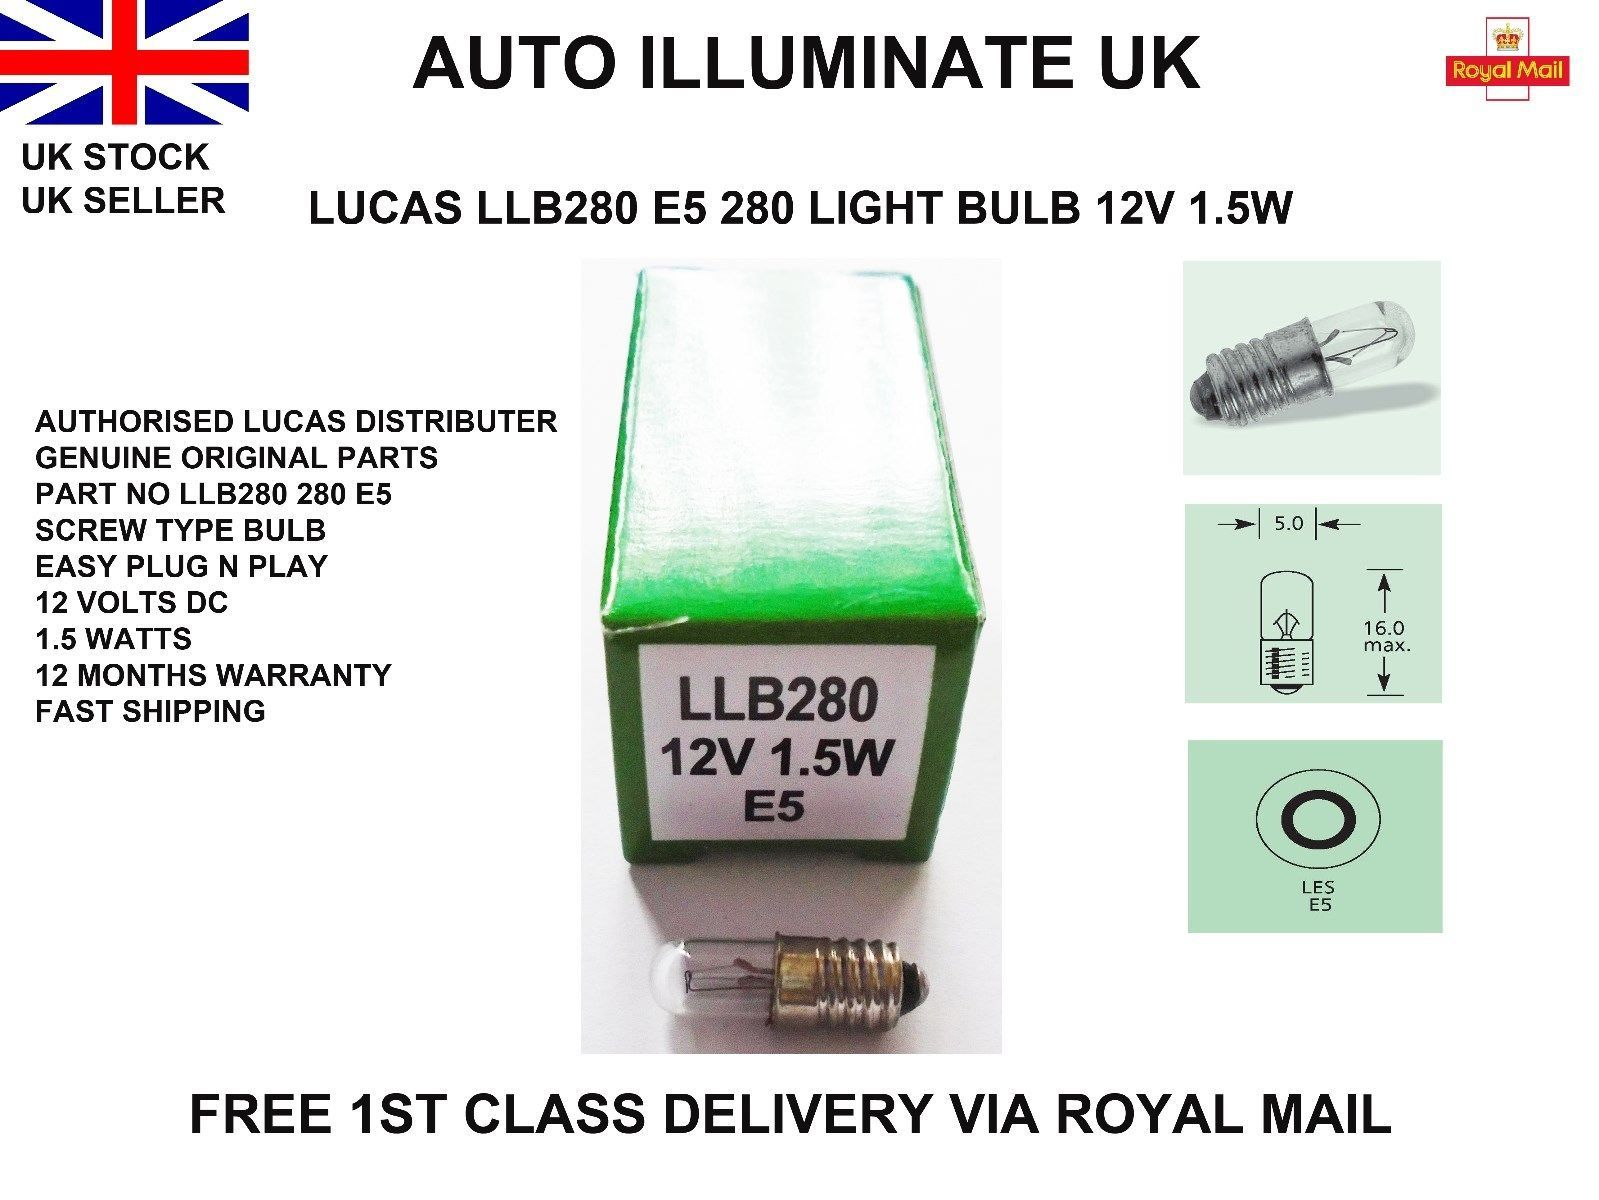 Lucas LLB280 12V 1.5W LES Bulbs Les Car Dashboard Clock Light Bulb